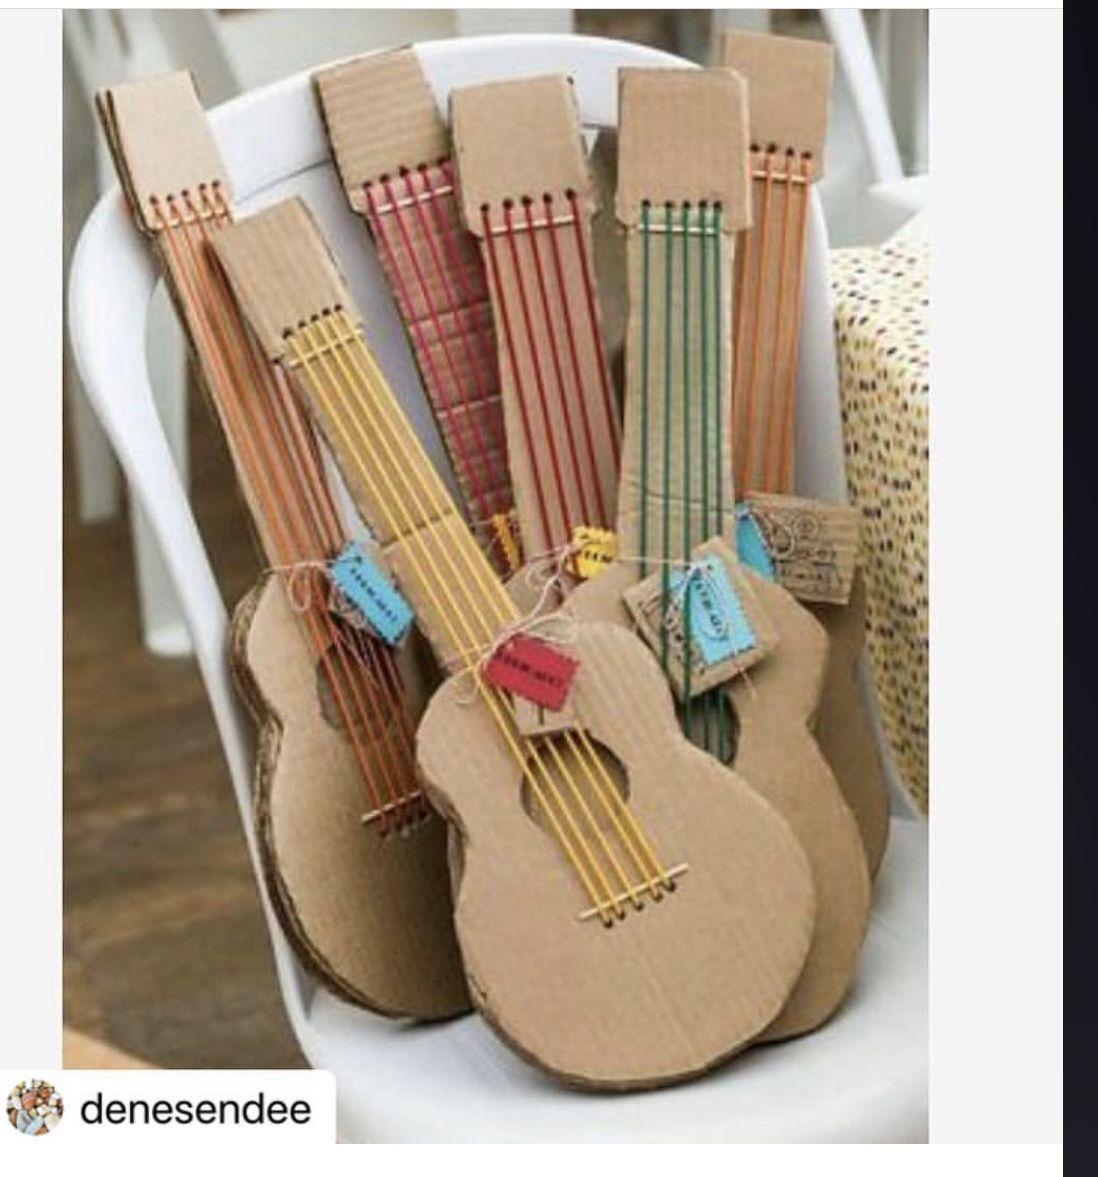 Decorate Own Balsa Wood Ukulele Music Crafts Diy Instruments Toddler Crafts